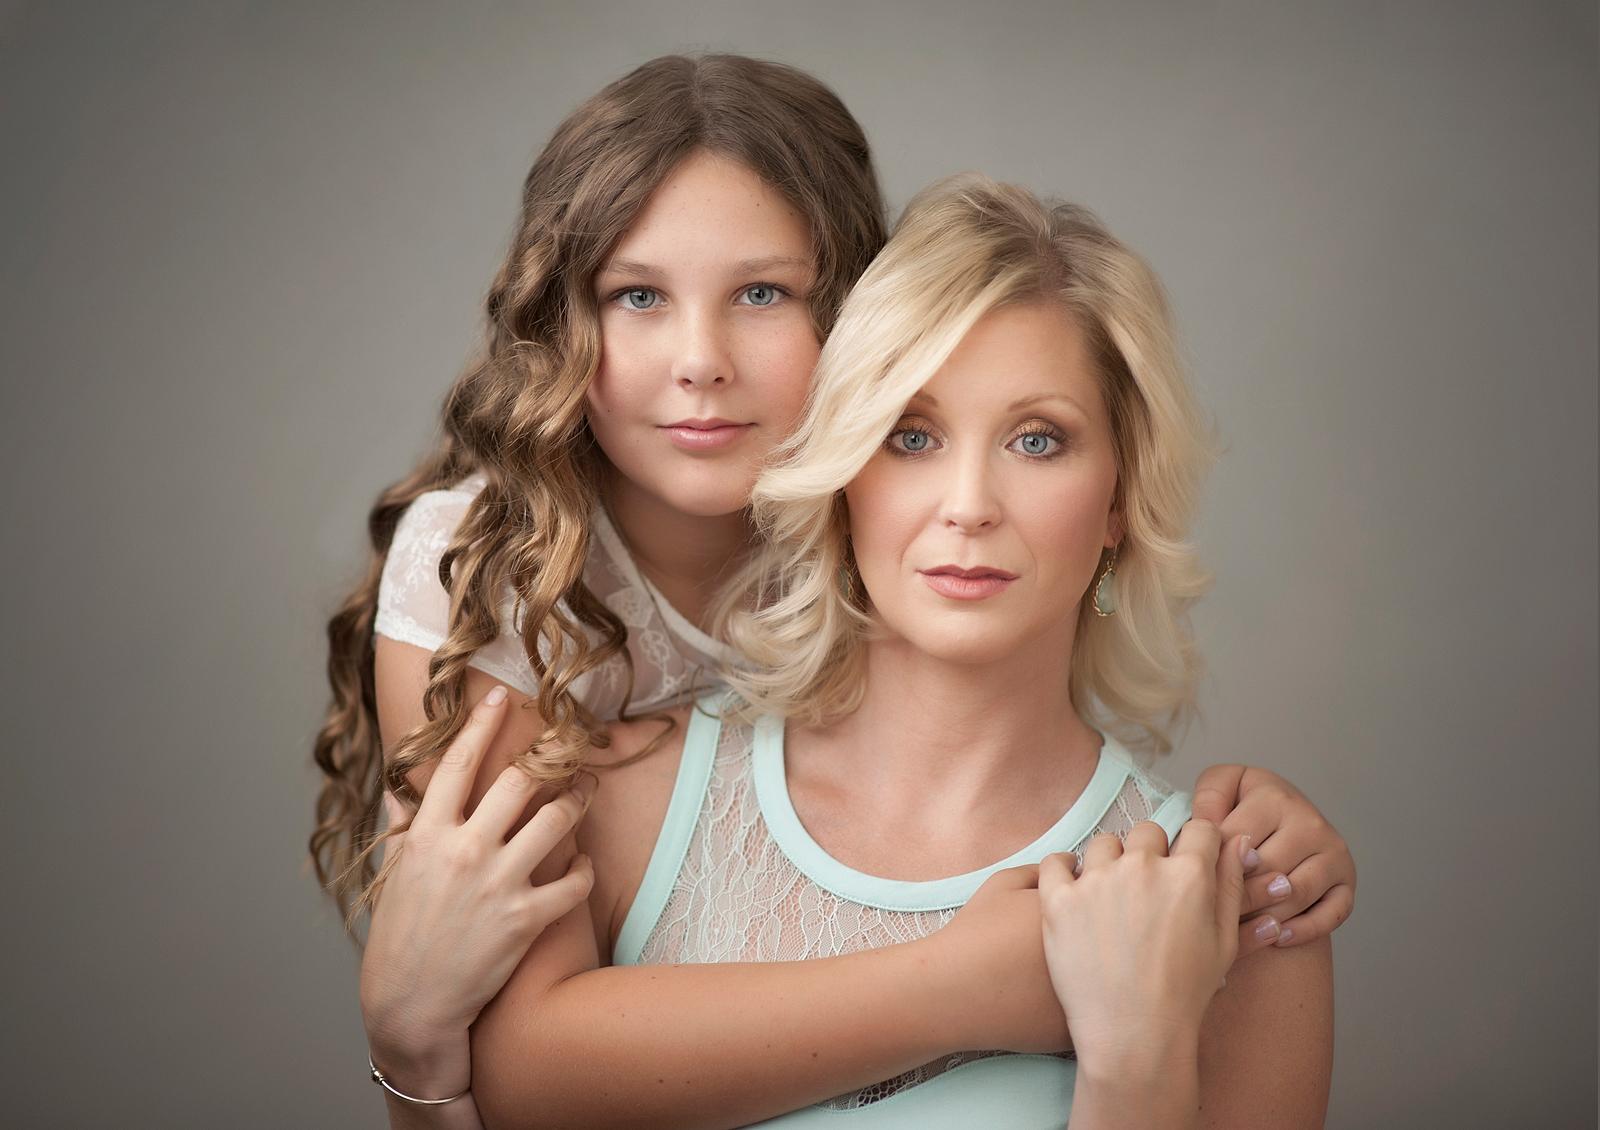 16-captivating-eyes-mother-daughter-fashion-model-soft.jpg